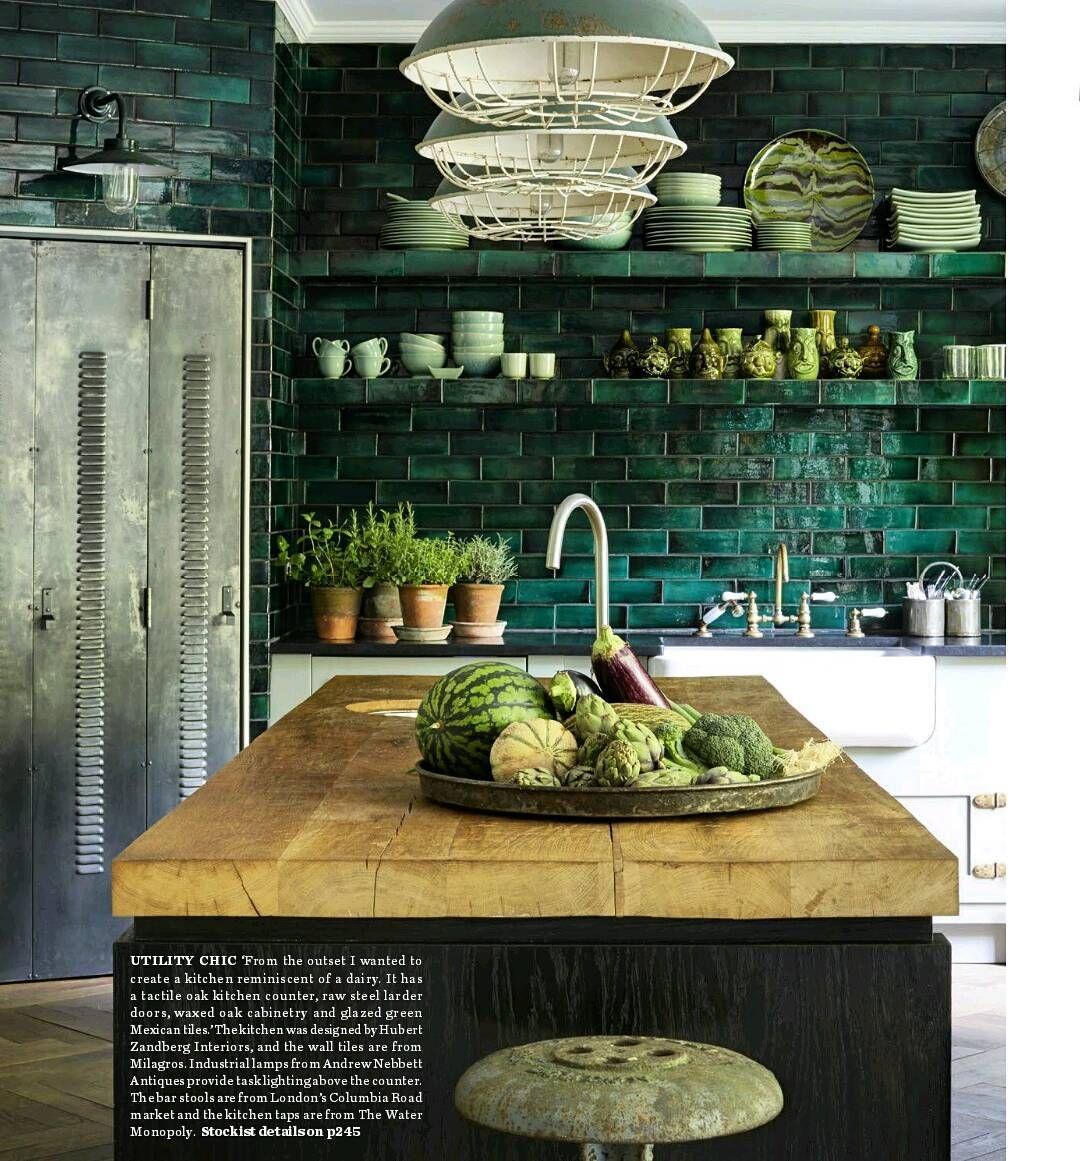 Green Kitchen Travels: ELLE Decoration April 2017 Milagros Tiles #milagros